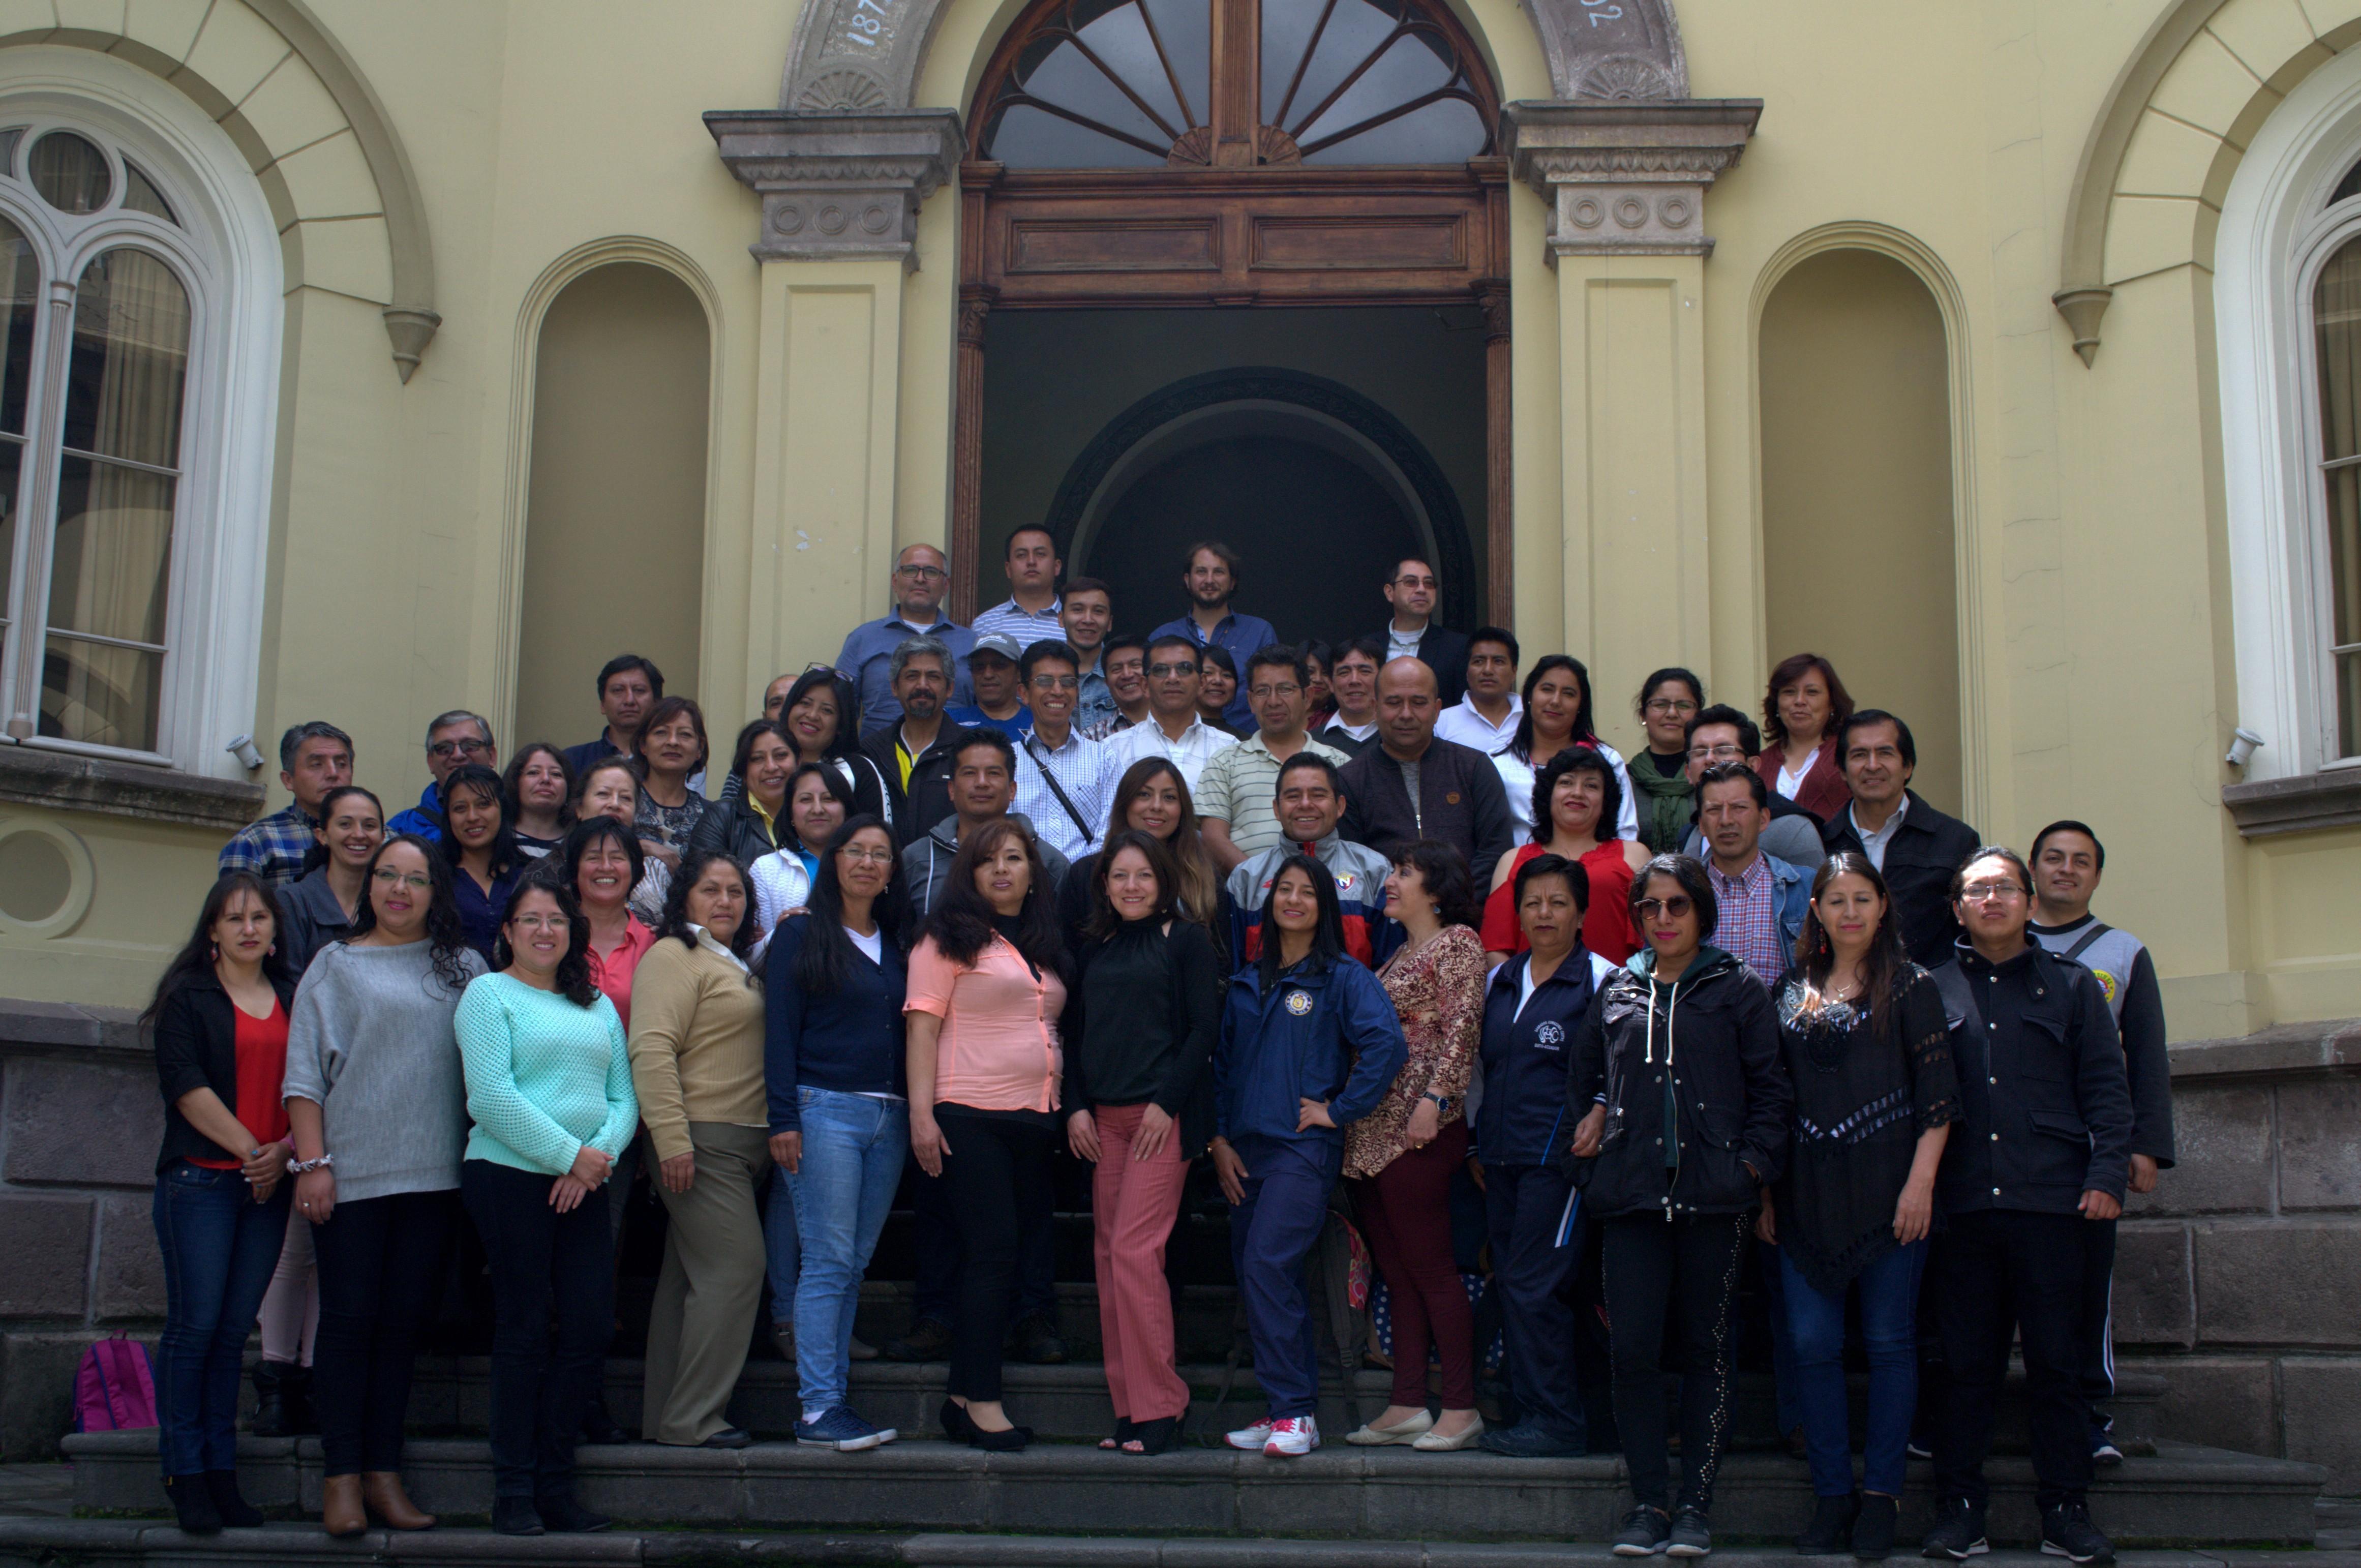 Noticias 2018 - Observatorio Astronómico de Quito - OAQ